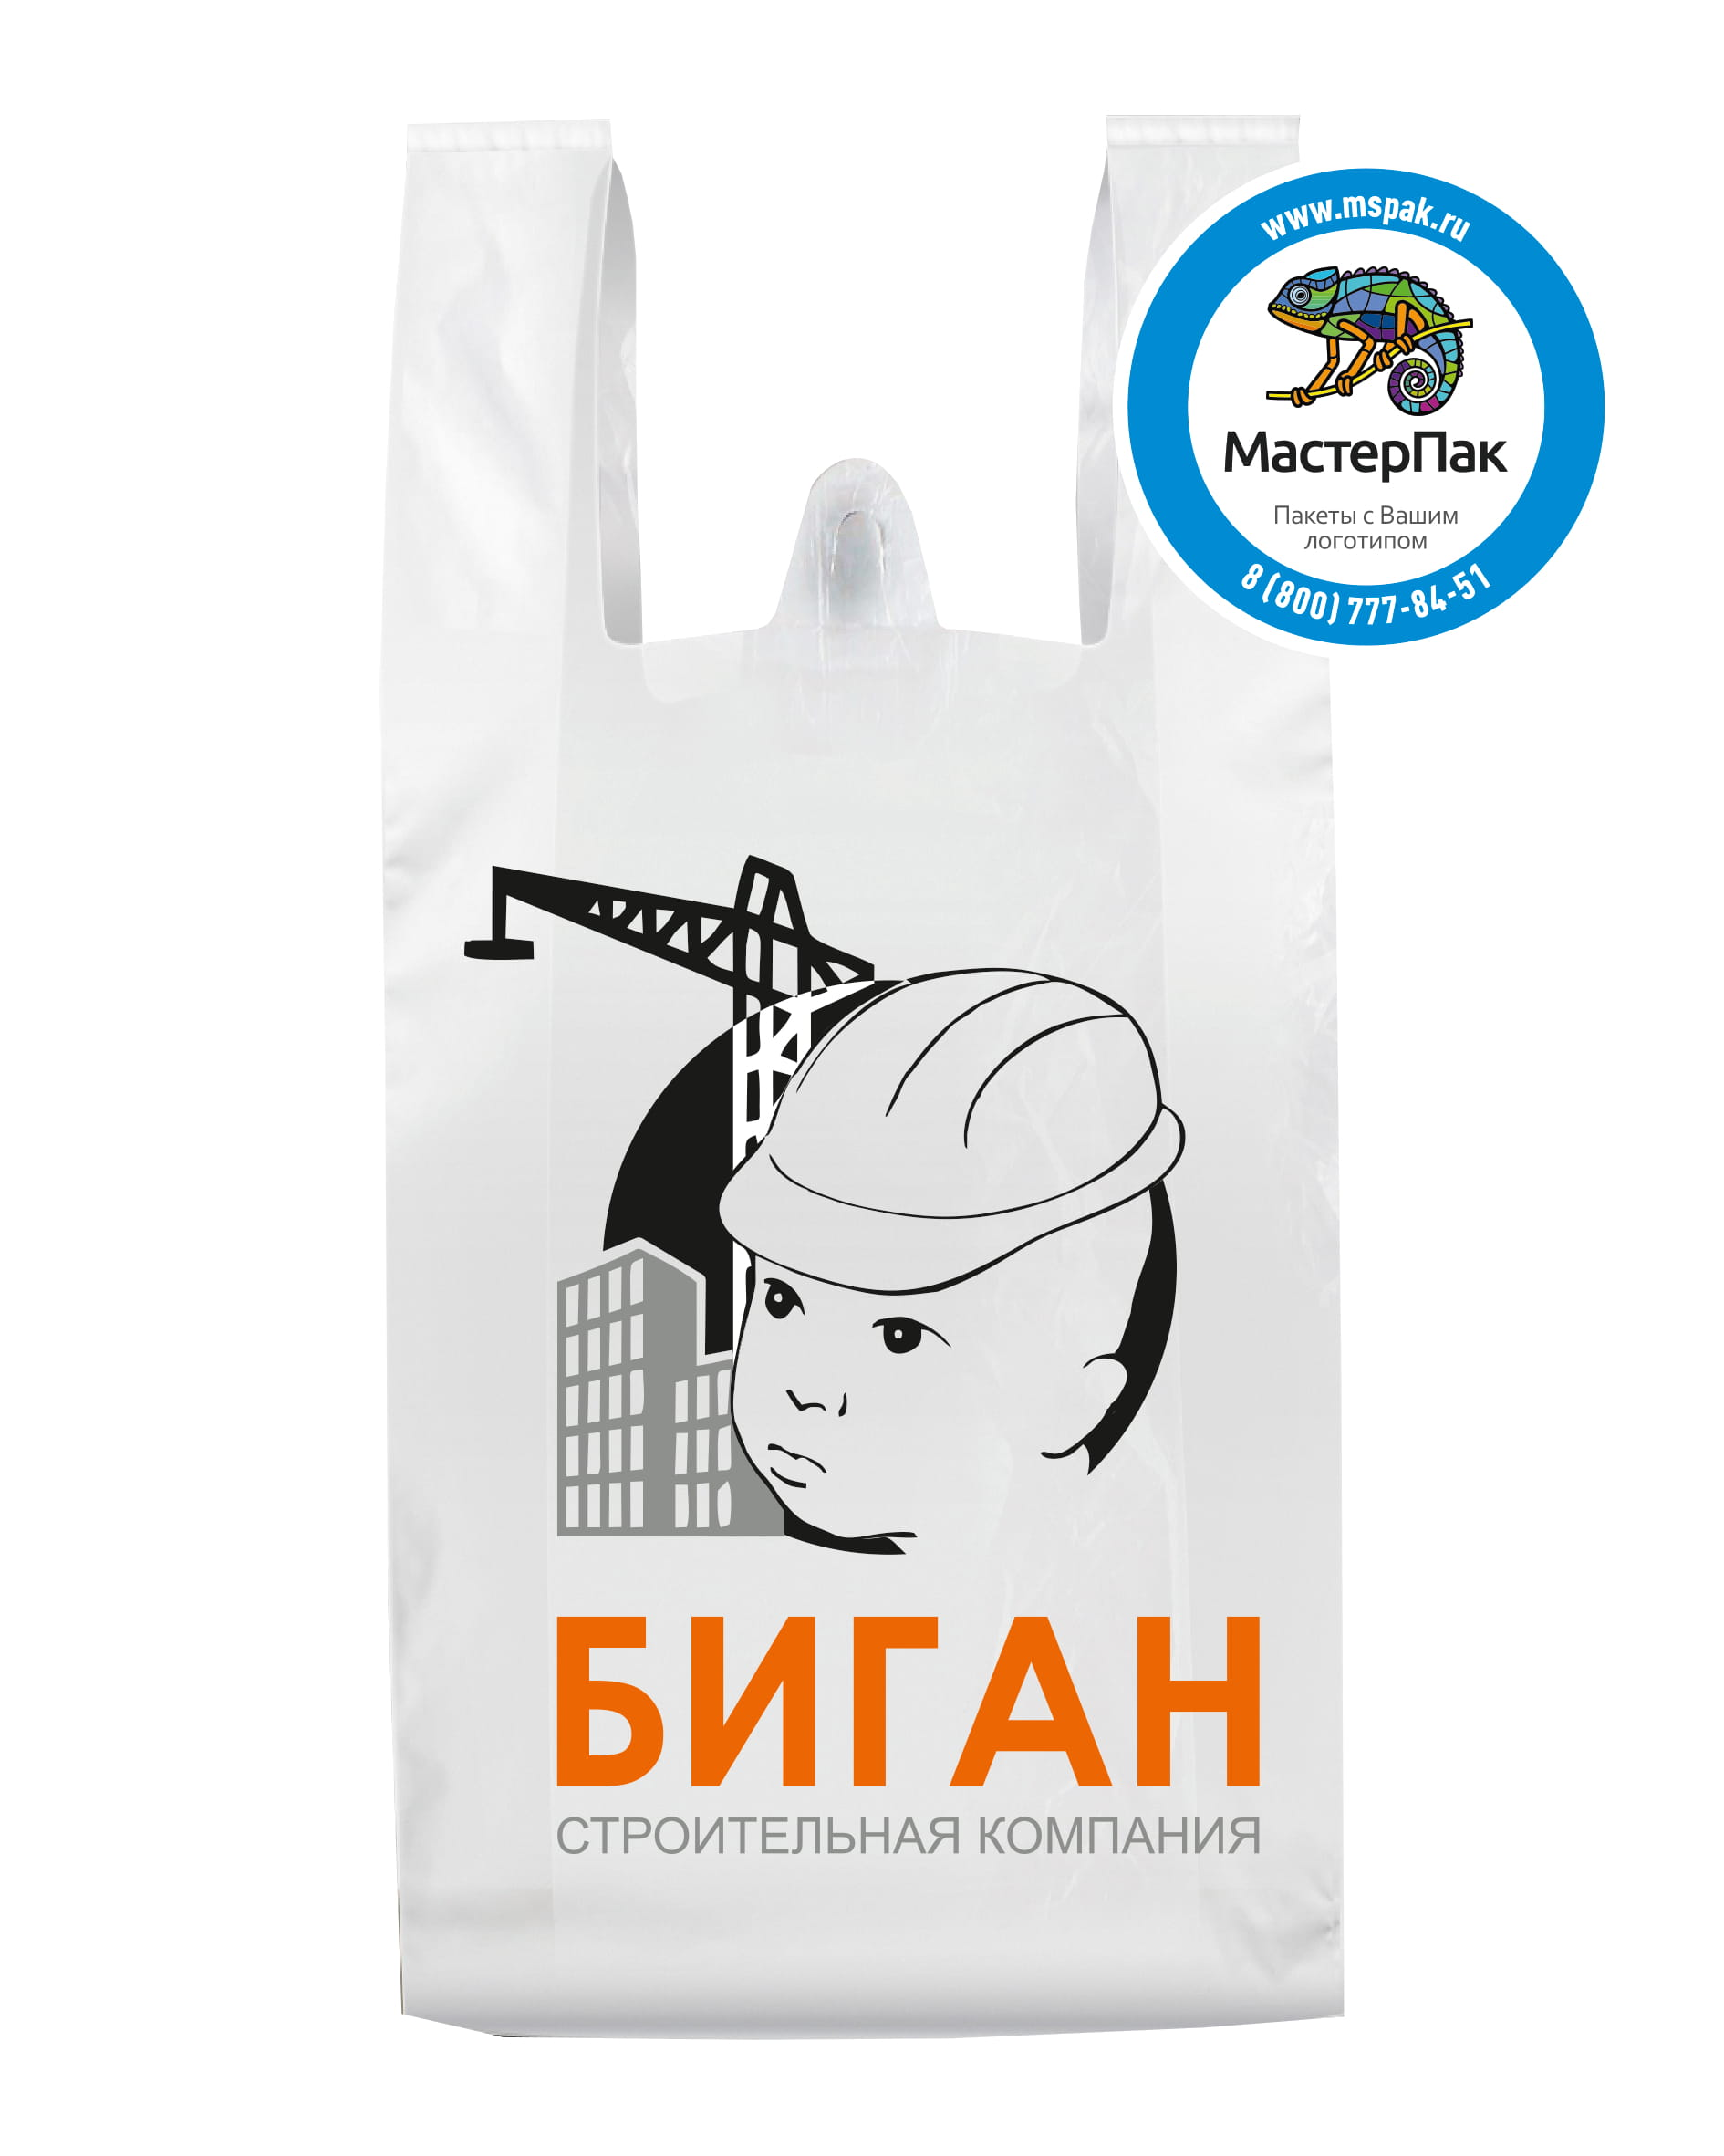 Пакет-майка с ПНД с логотипом Биган, Спб, 25 мкм, 30*60, белый